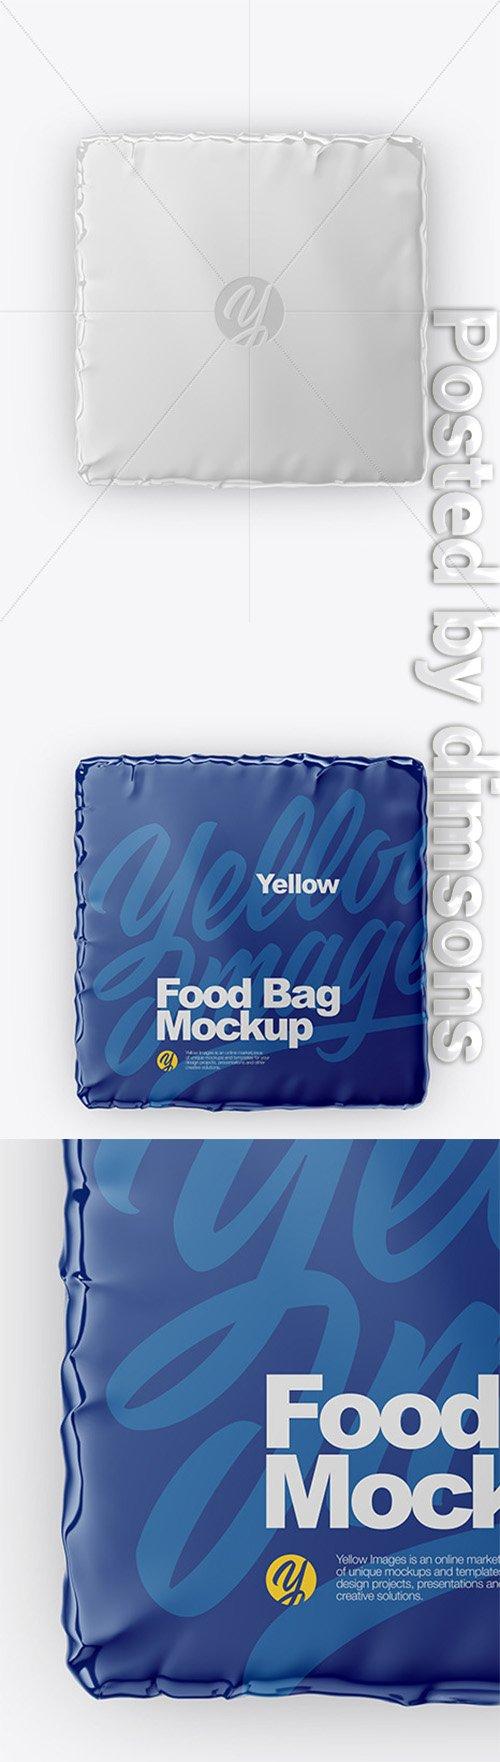 Glossy Food Bag Mockup 47149 TIF